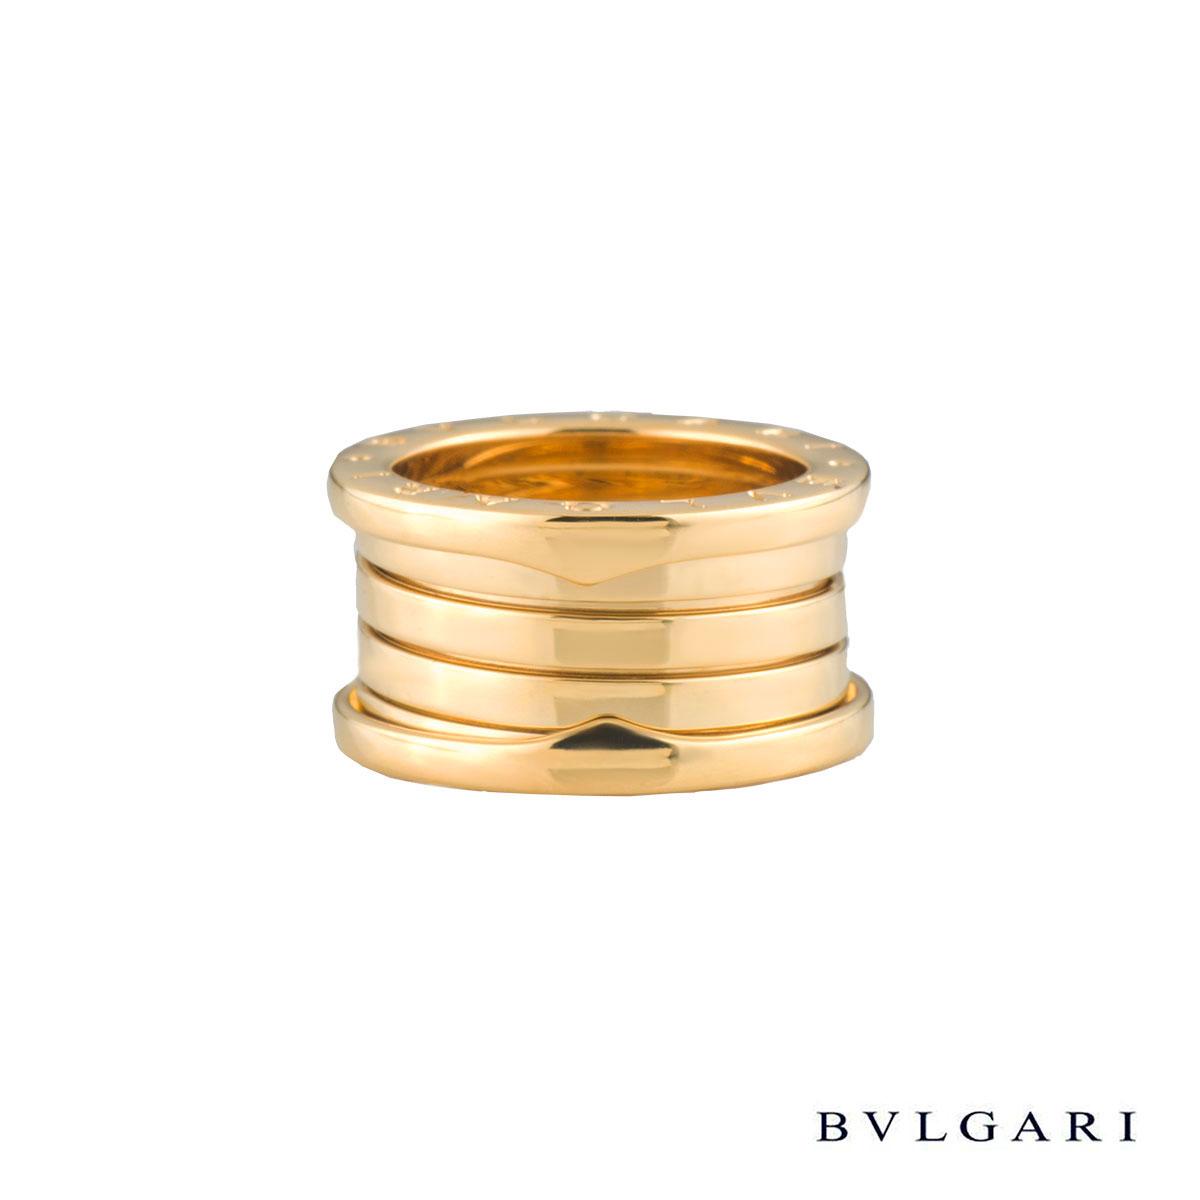 BvlgariYellow GoldB.Zero1 Ring AN191025